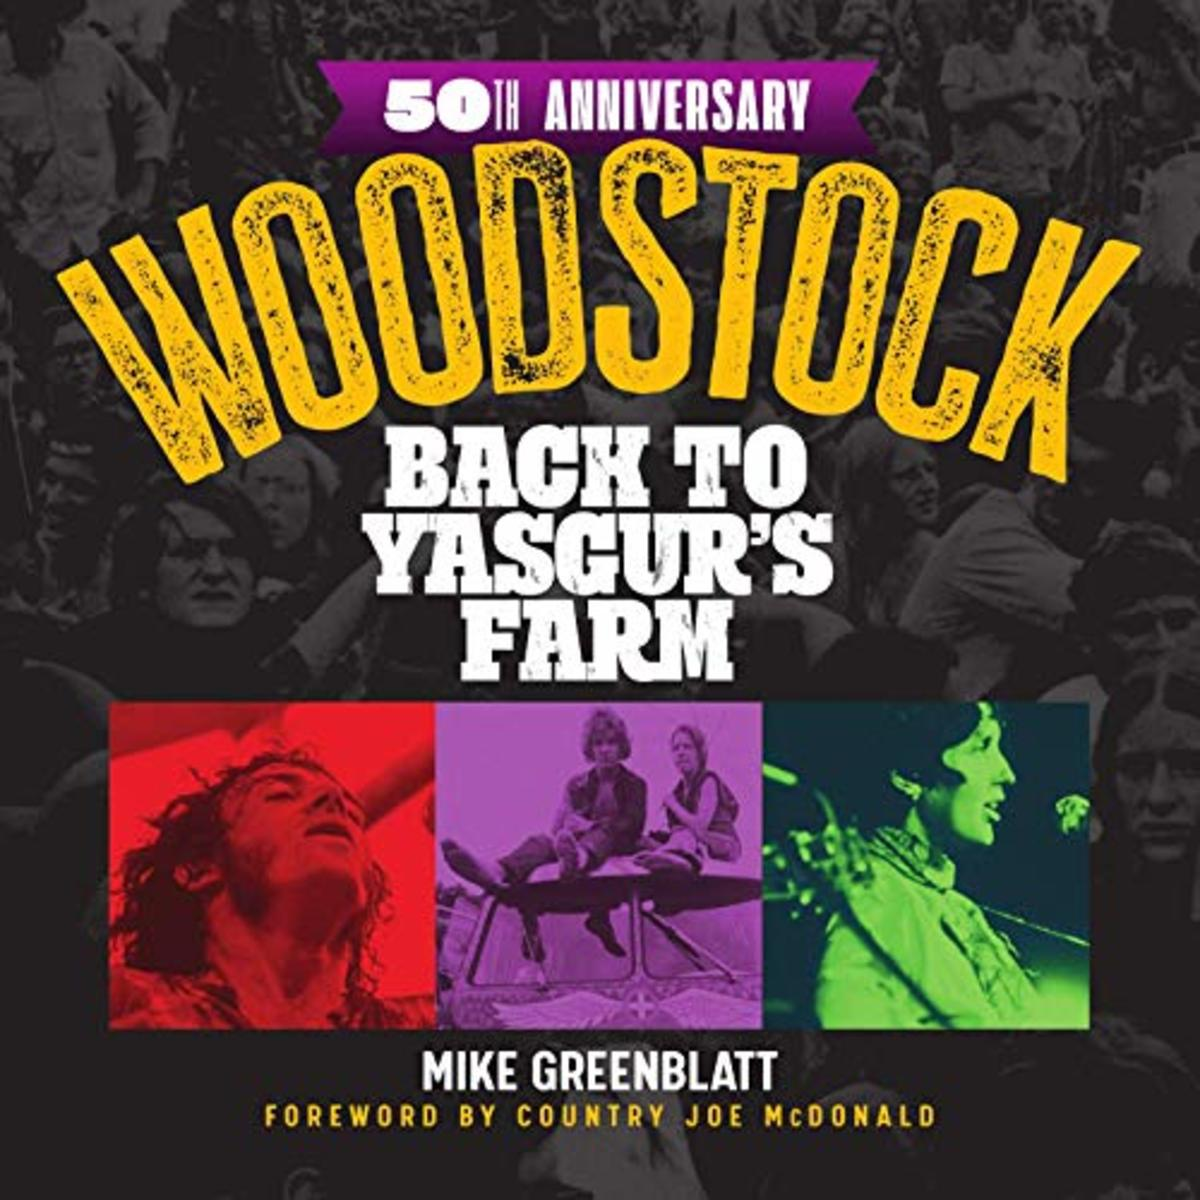 WoodstockBack to Yasgurs-Farm